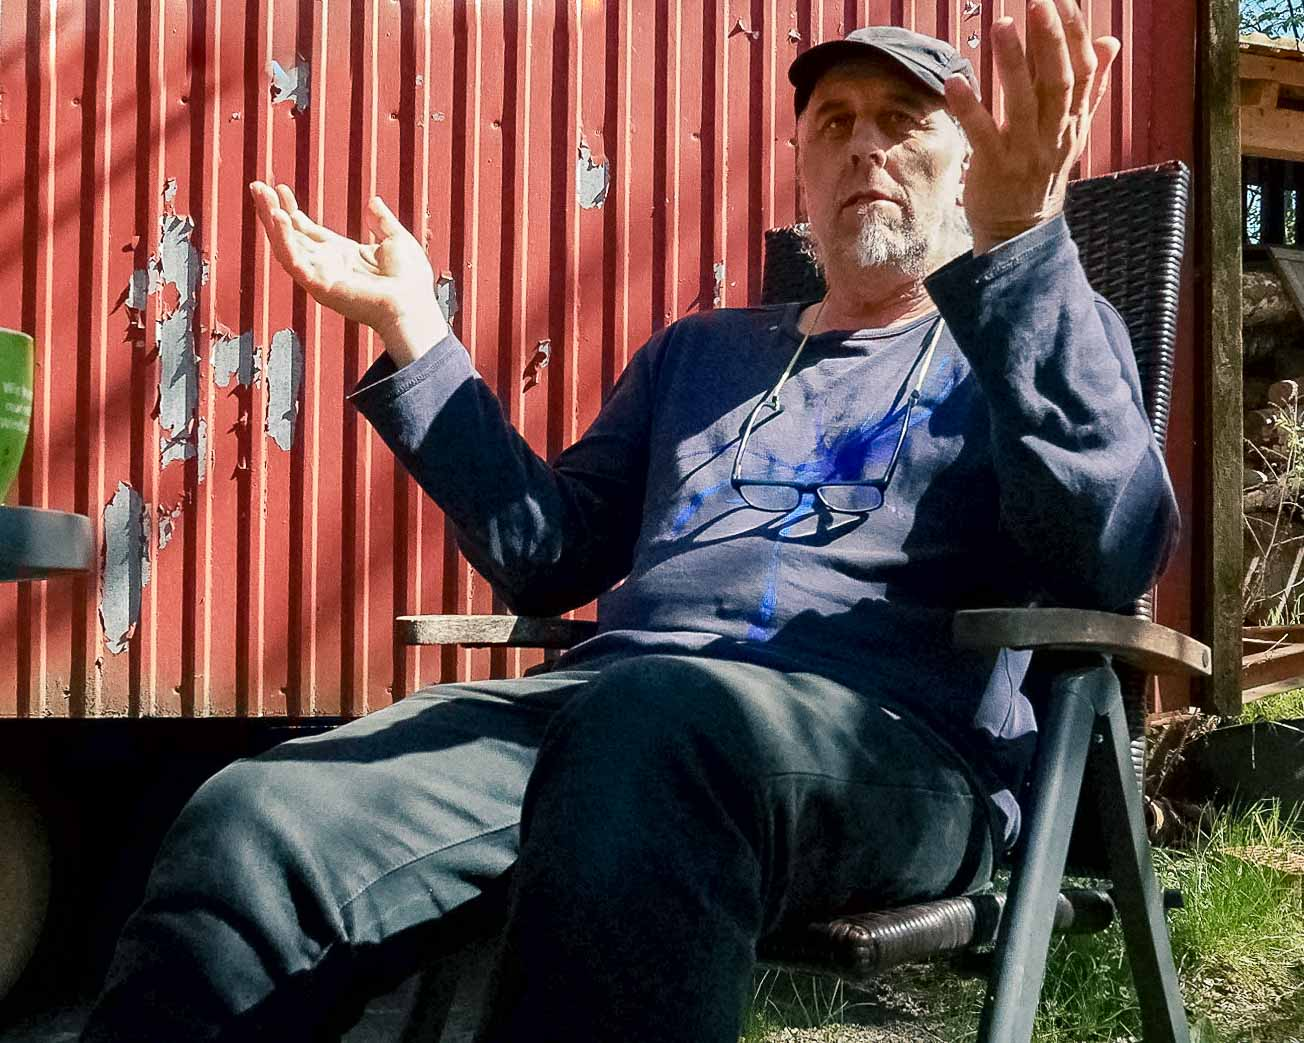 Gerd Büttner, Wunderpunkt Sallahn